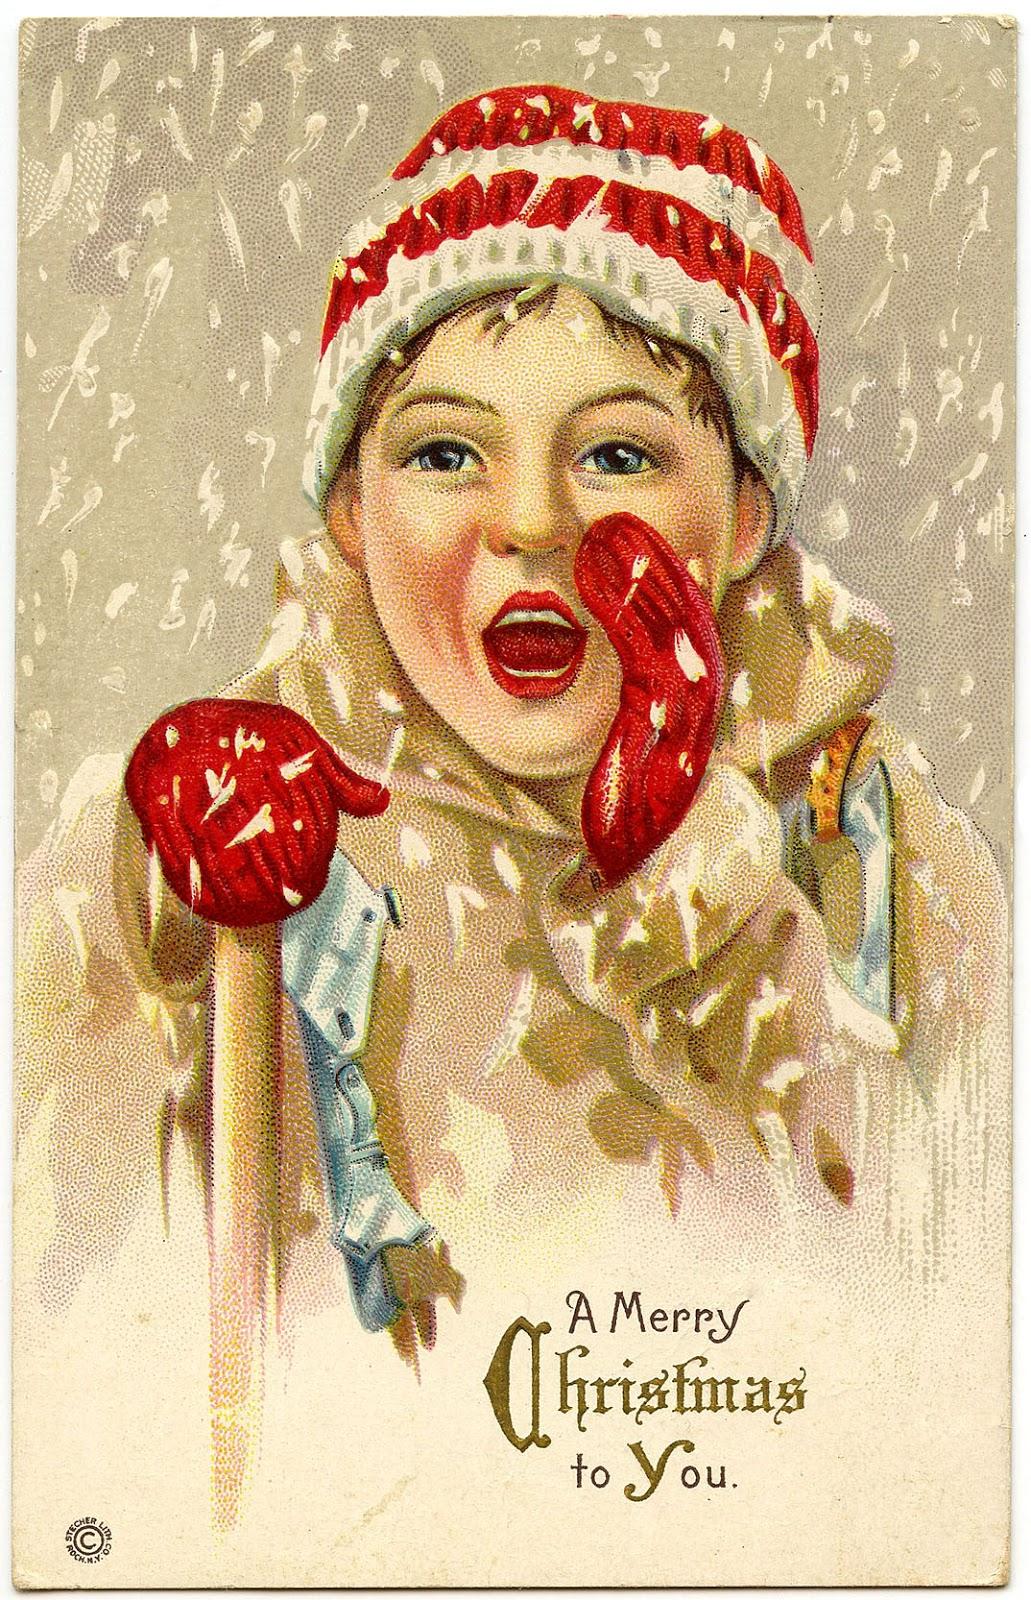 Happy vintage Christmas!